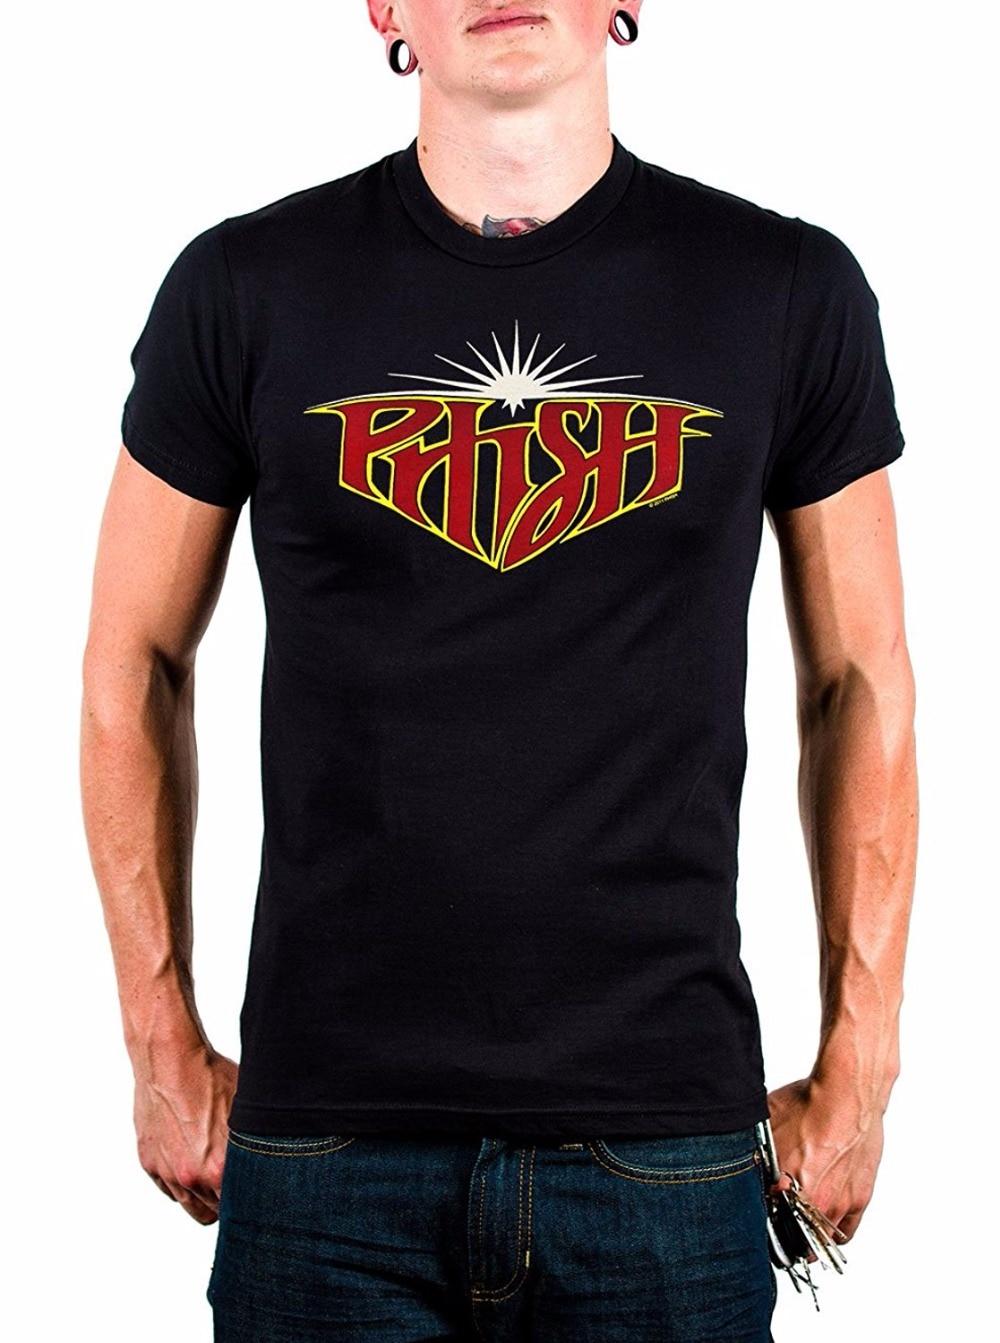 2018 New Arrival Mens Fashion Silk Road Tees Gift Funny DoctorNaruto Buffy Merchandising Phish Starburst T-shirt